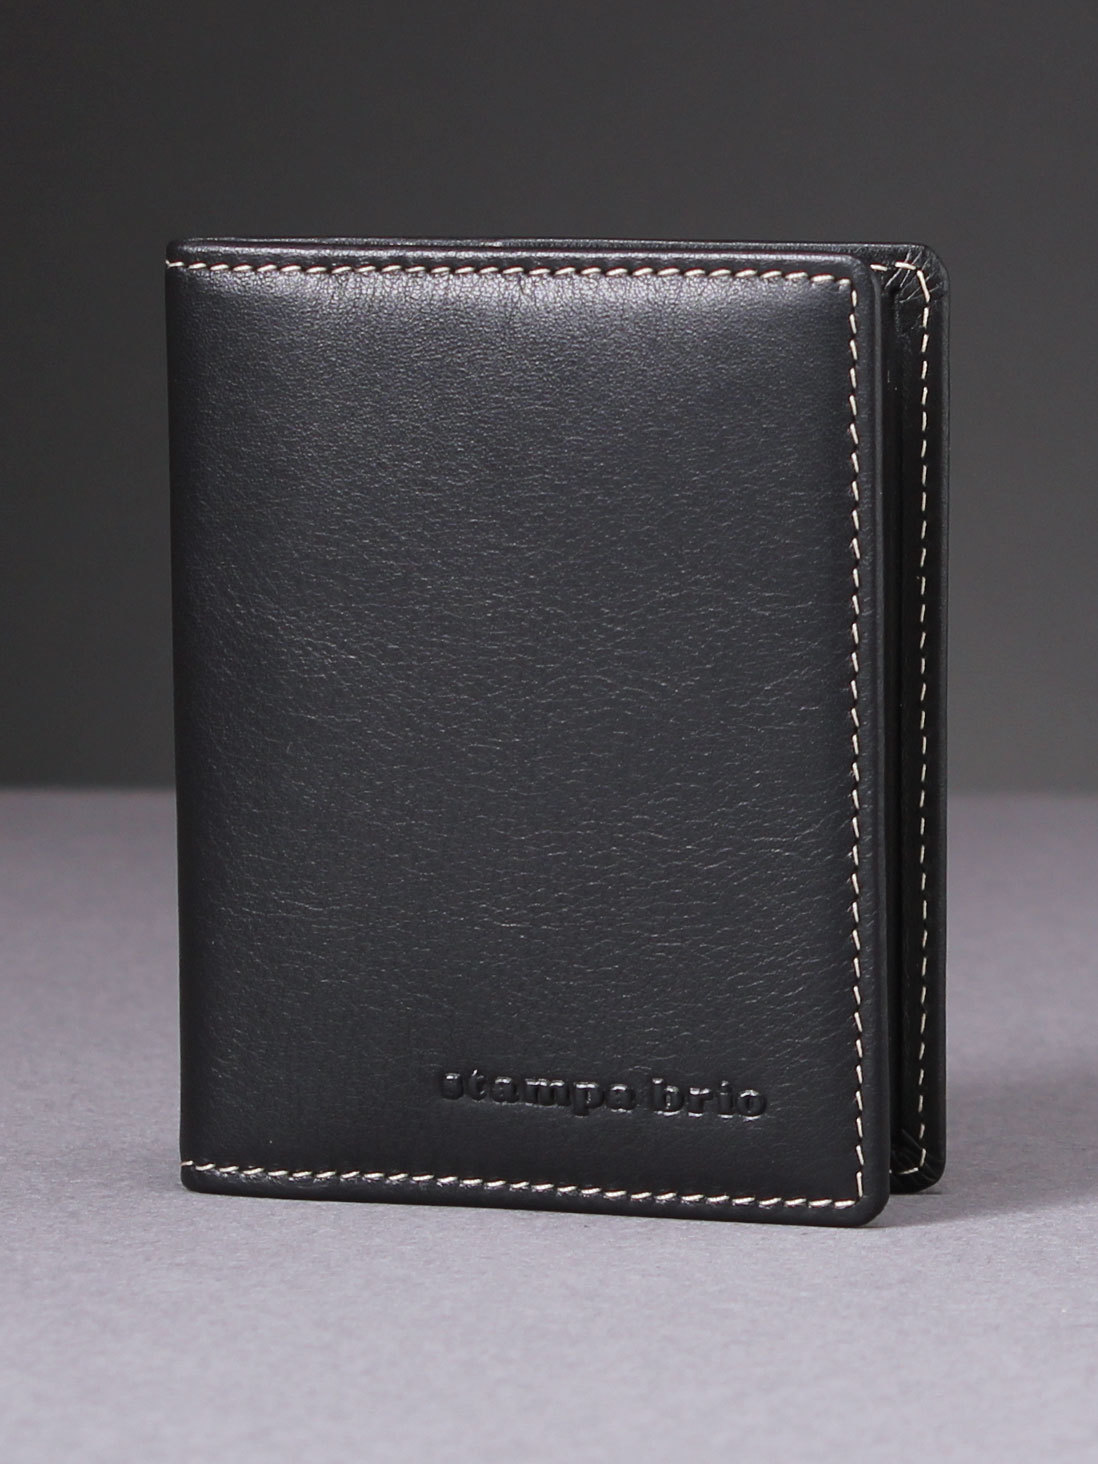 515 R - Футляр для карт с RFID защитой